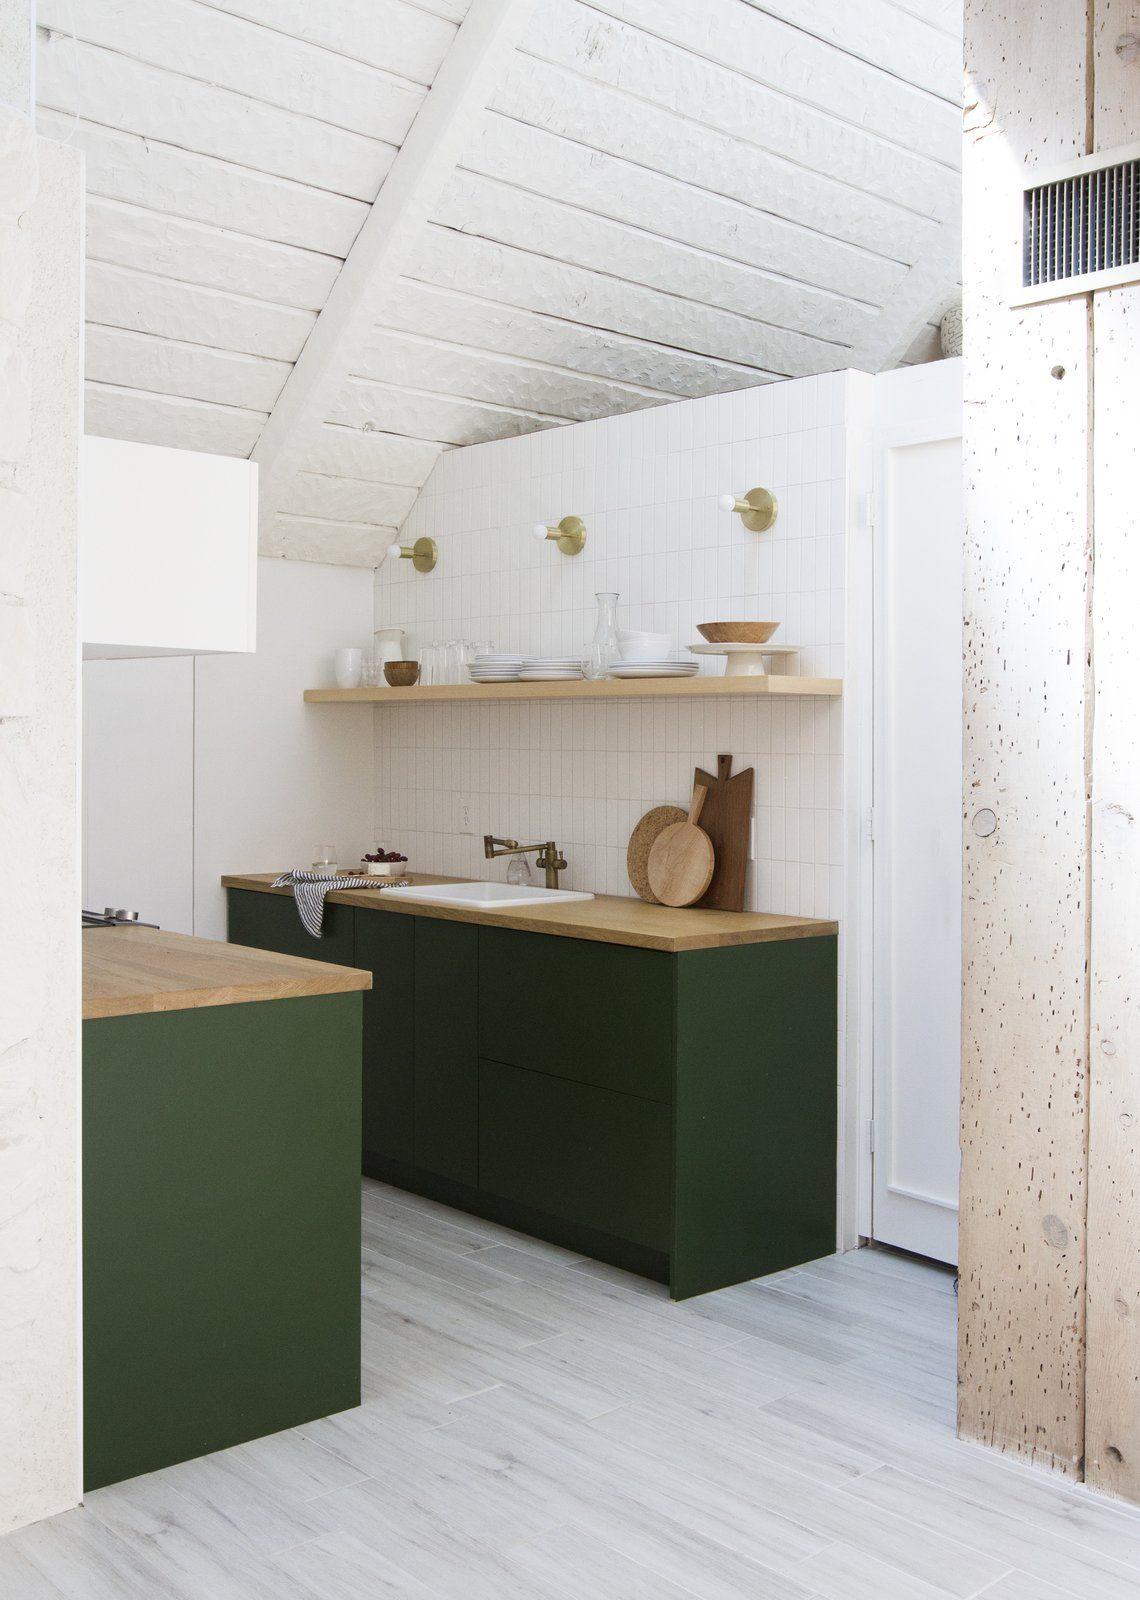 A Chic Renovated A Frame In Palm Springs Asks 535k Diy Kitchen Renovation Interior Design Kitchen Kitchen Style